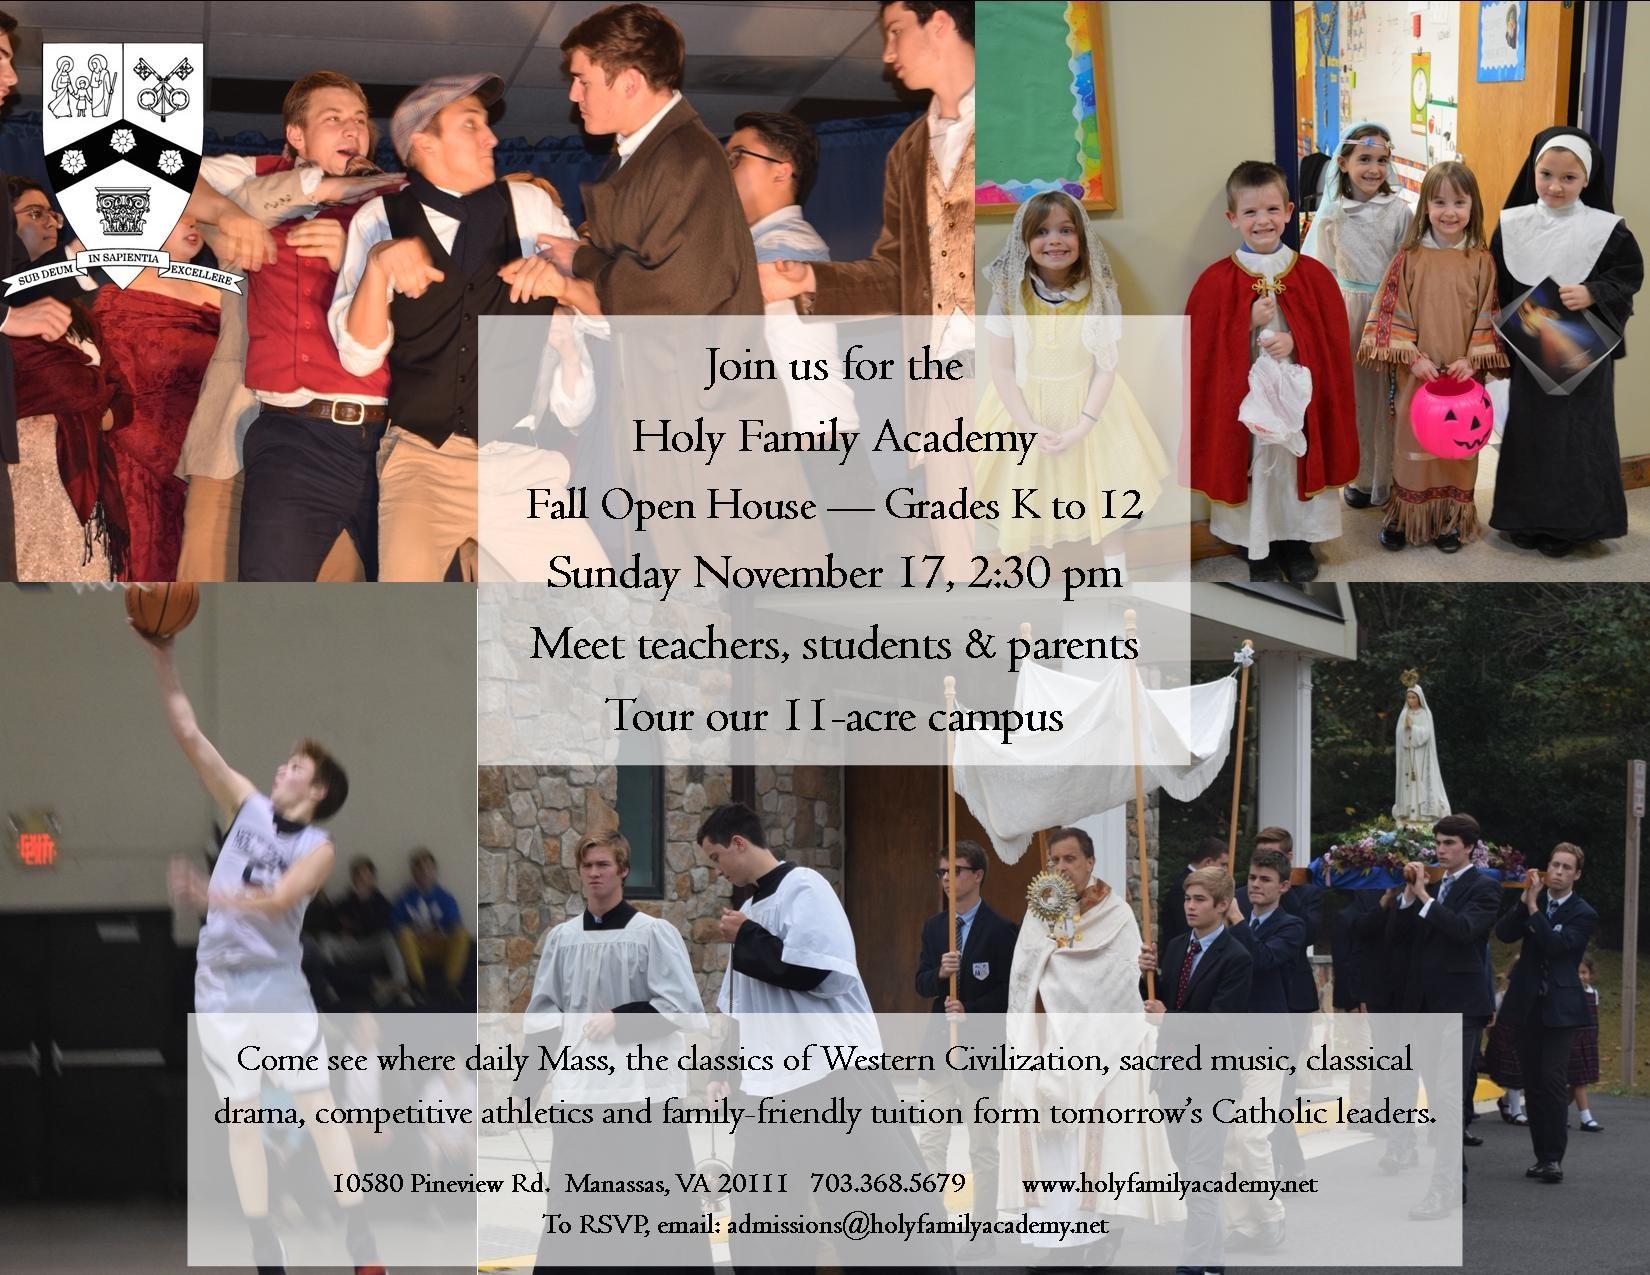 HFA 2019 Fall Open House Flyer